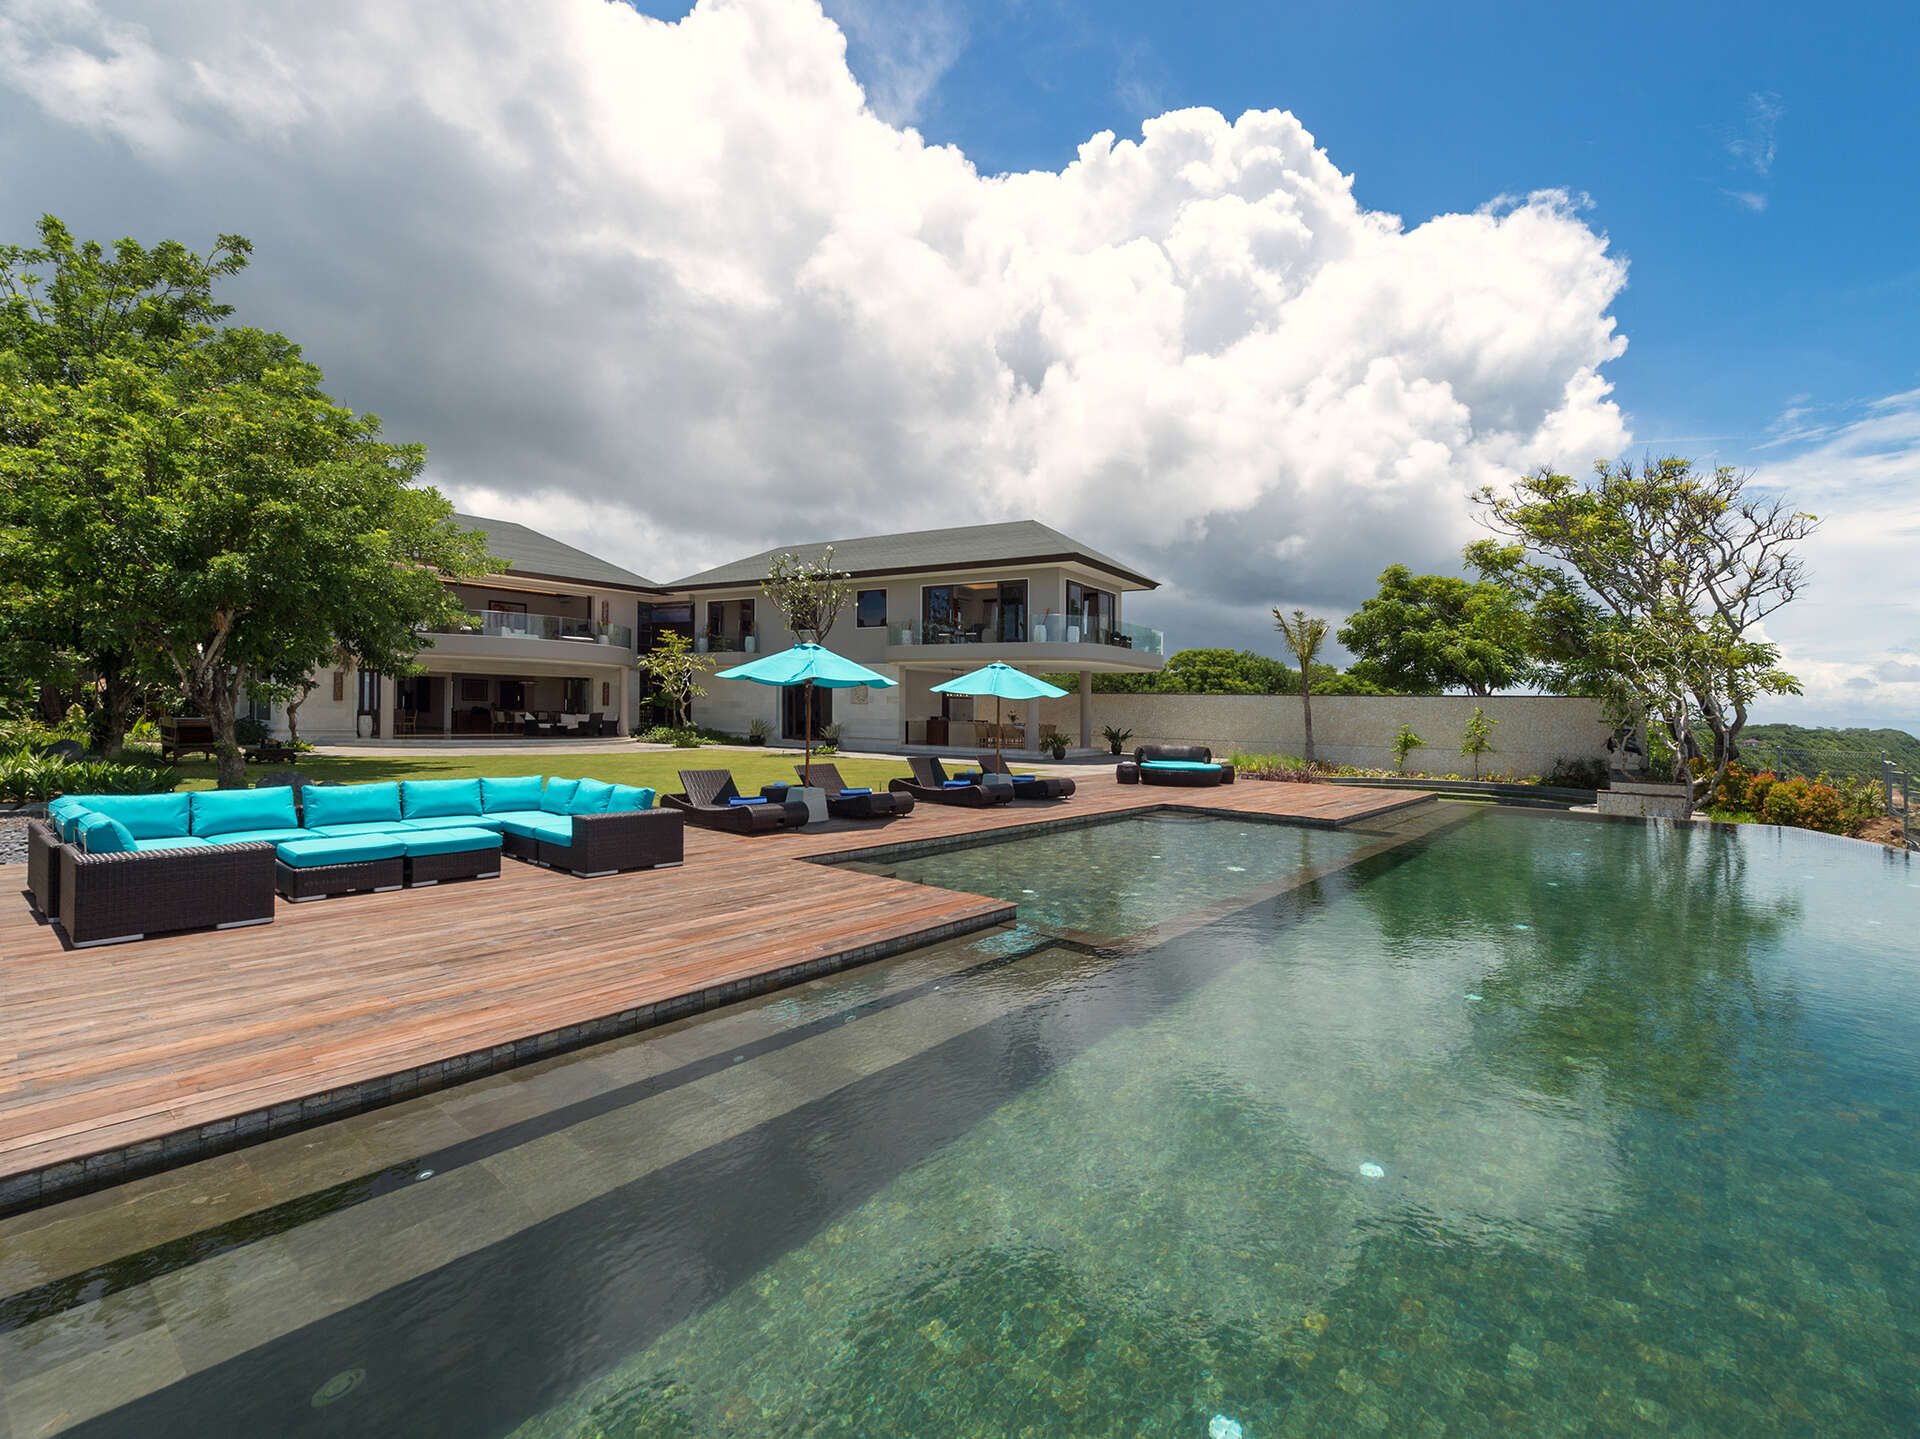 Luxury villa rentals asia - Indonesia - Bali - The bukit - Pala - Image 1/20